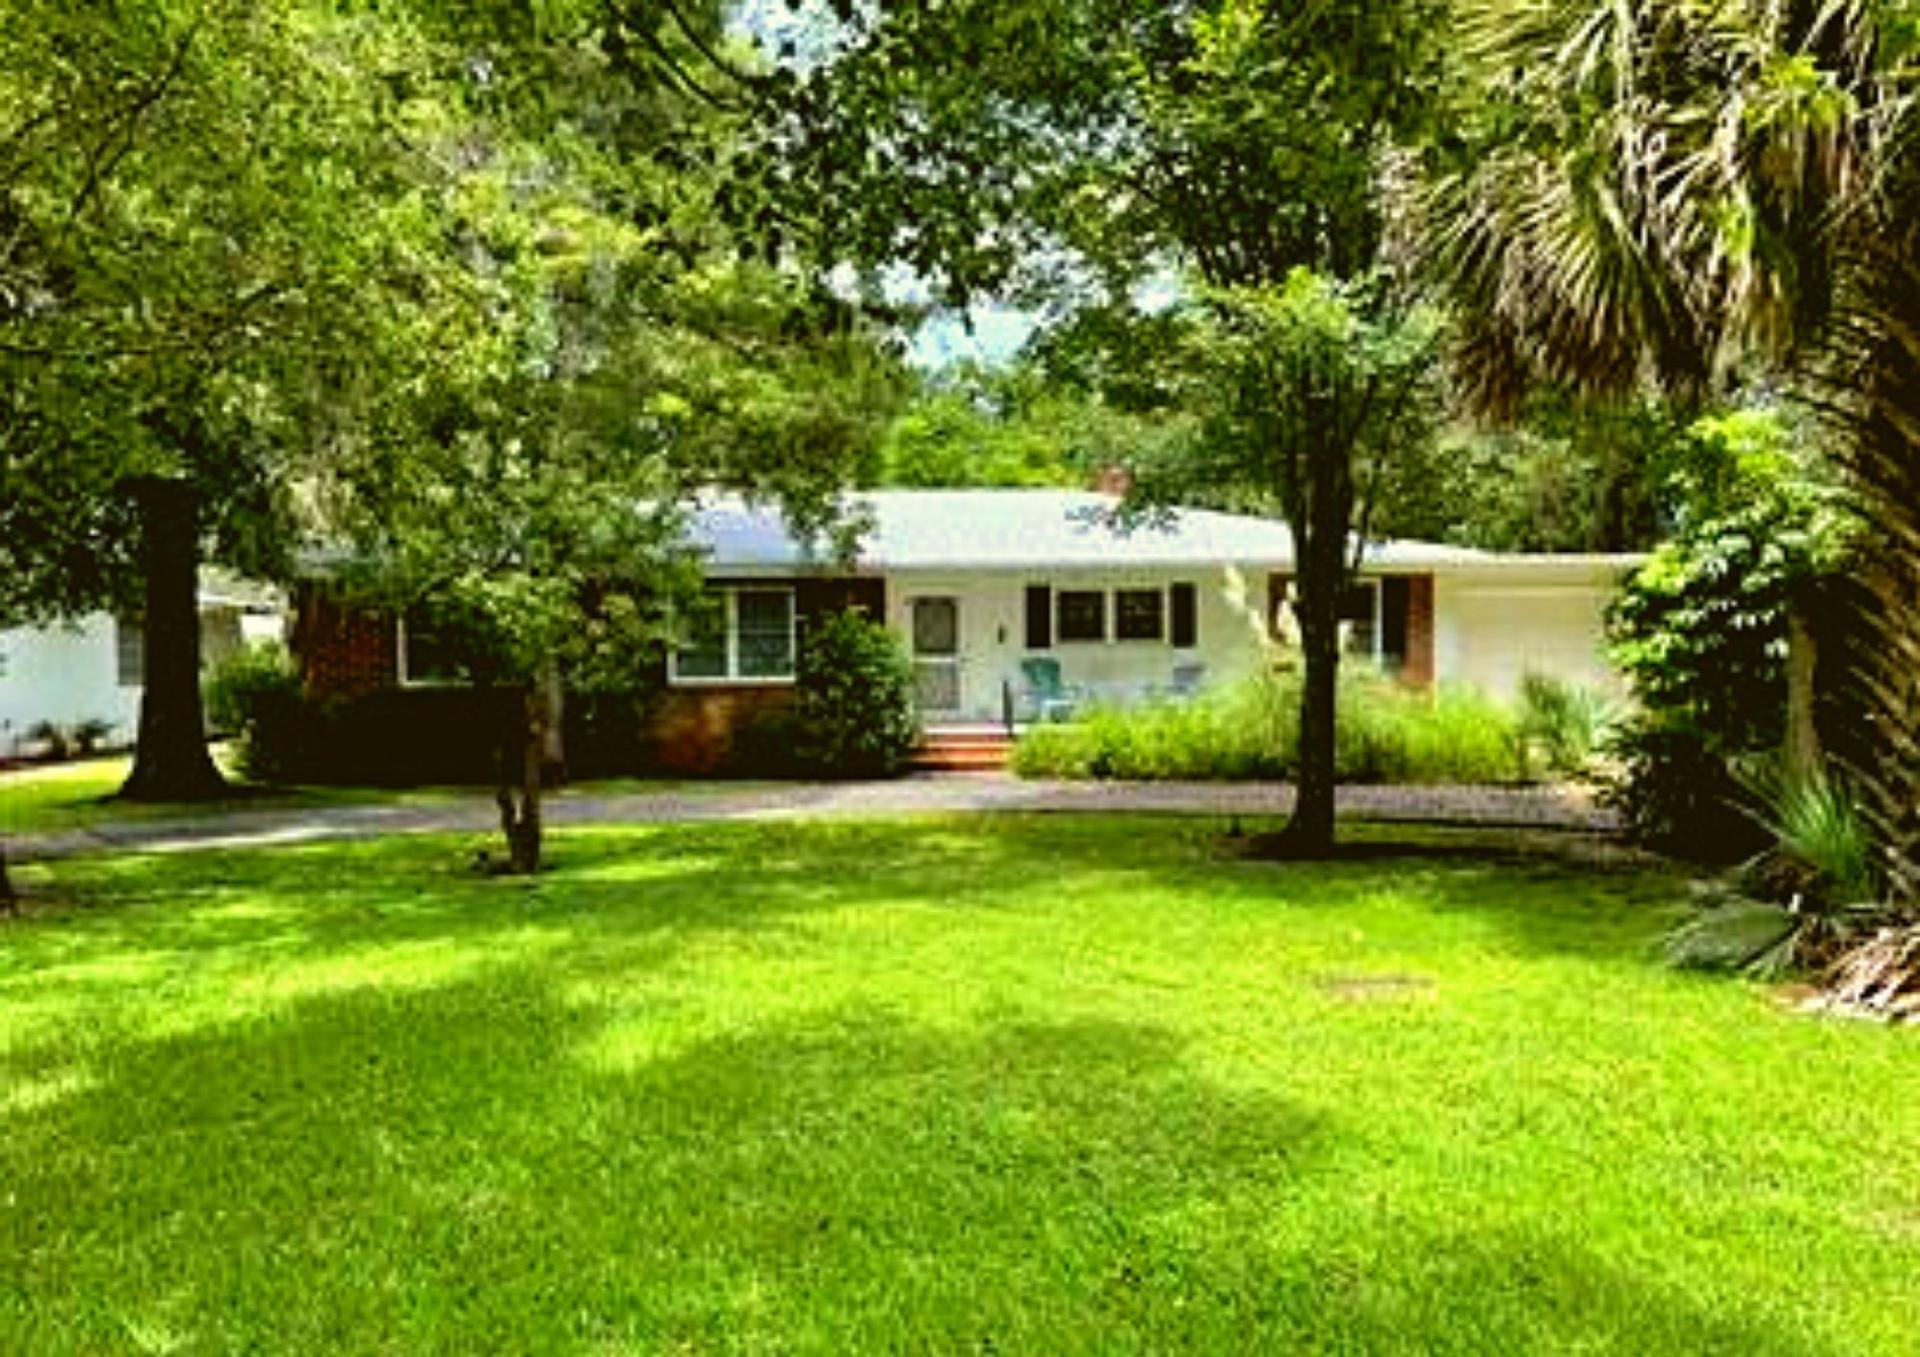 Photo of property: 1116 Florida Ave, Daytona Beach, FL 32114